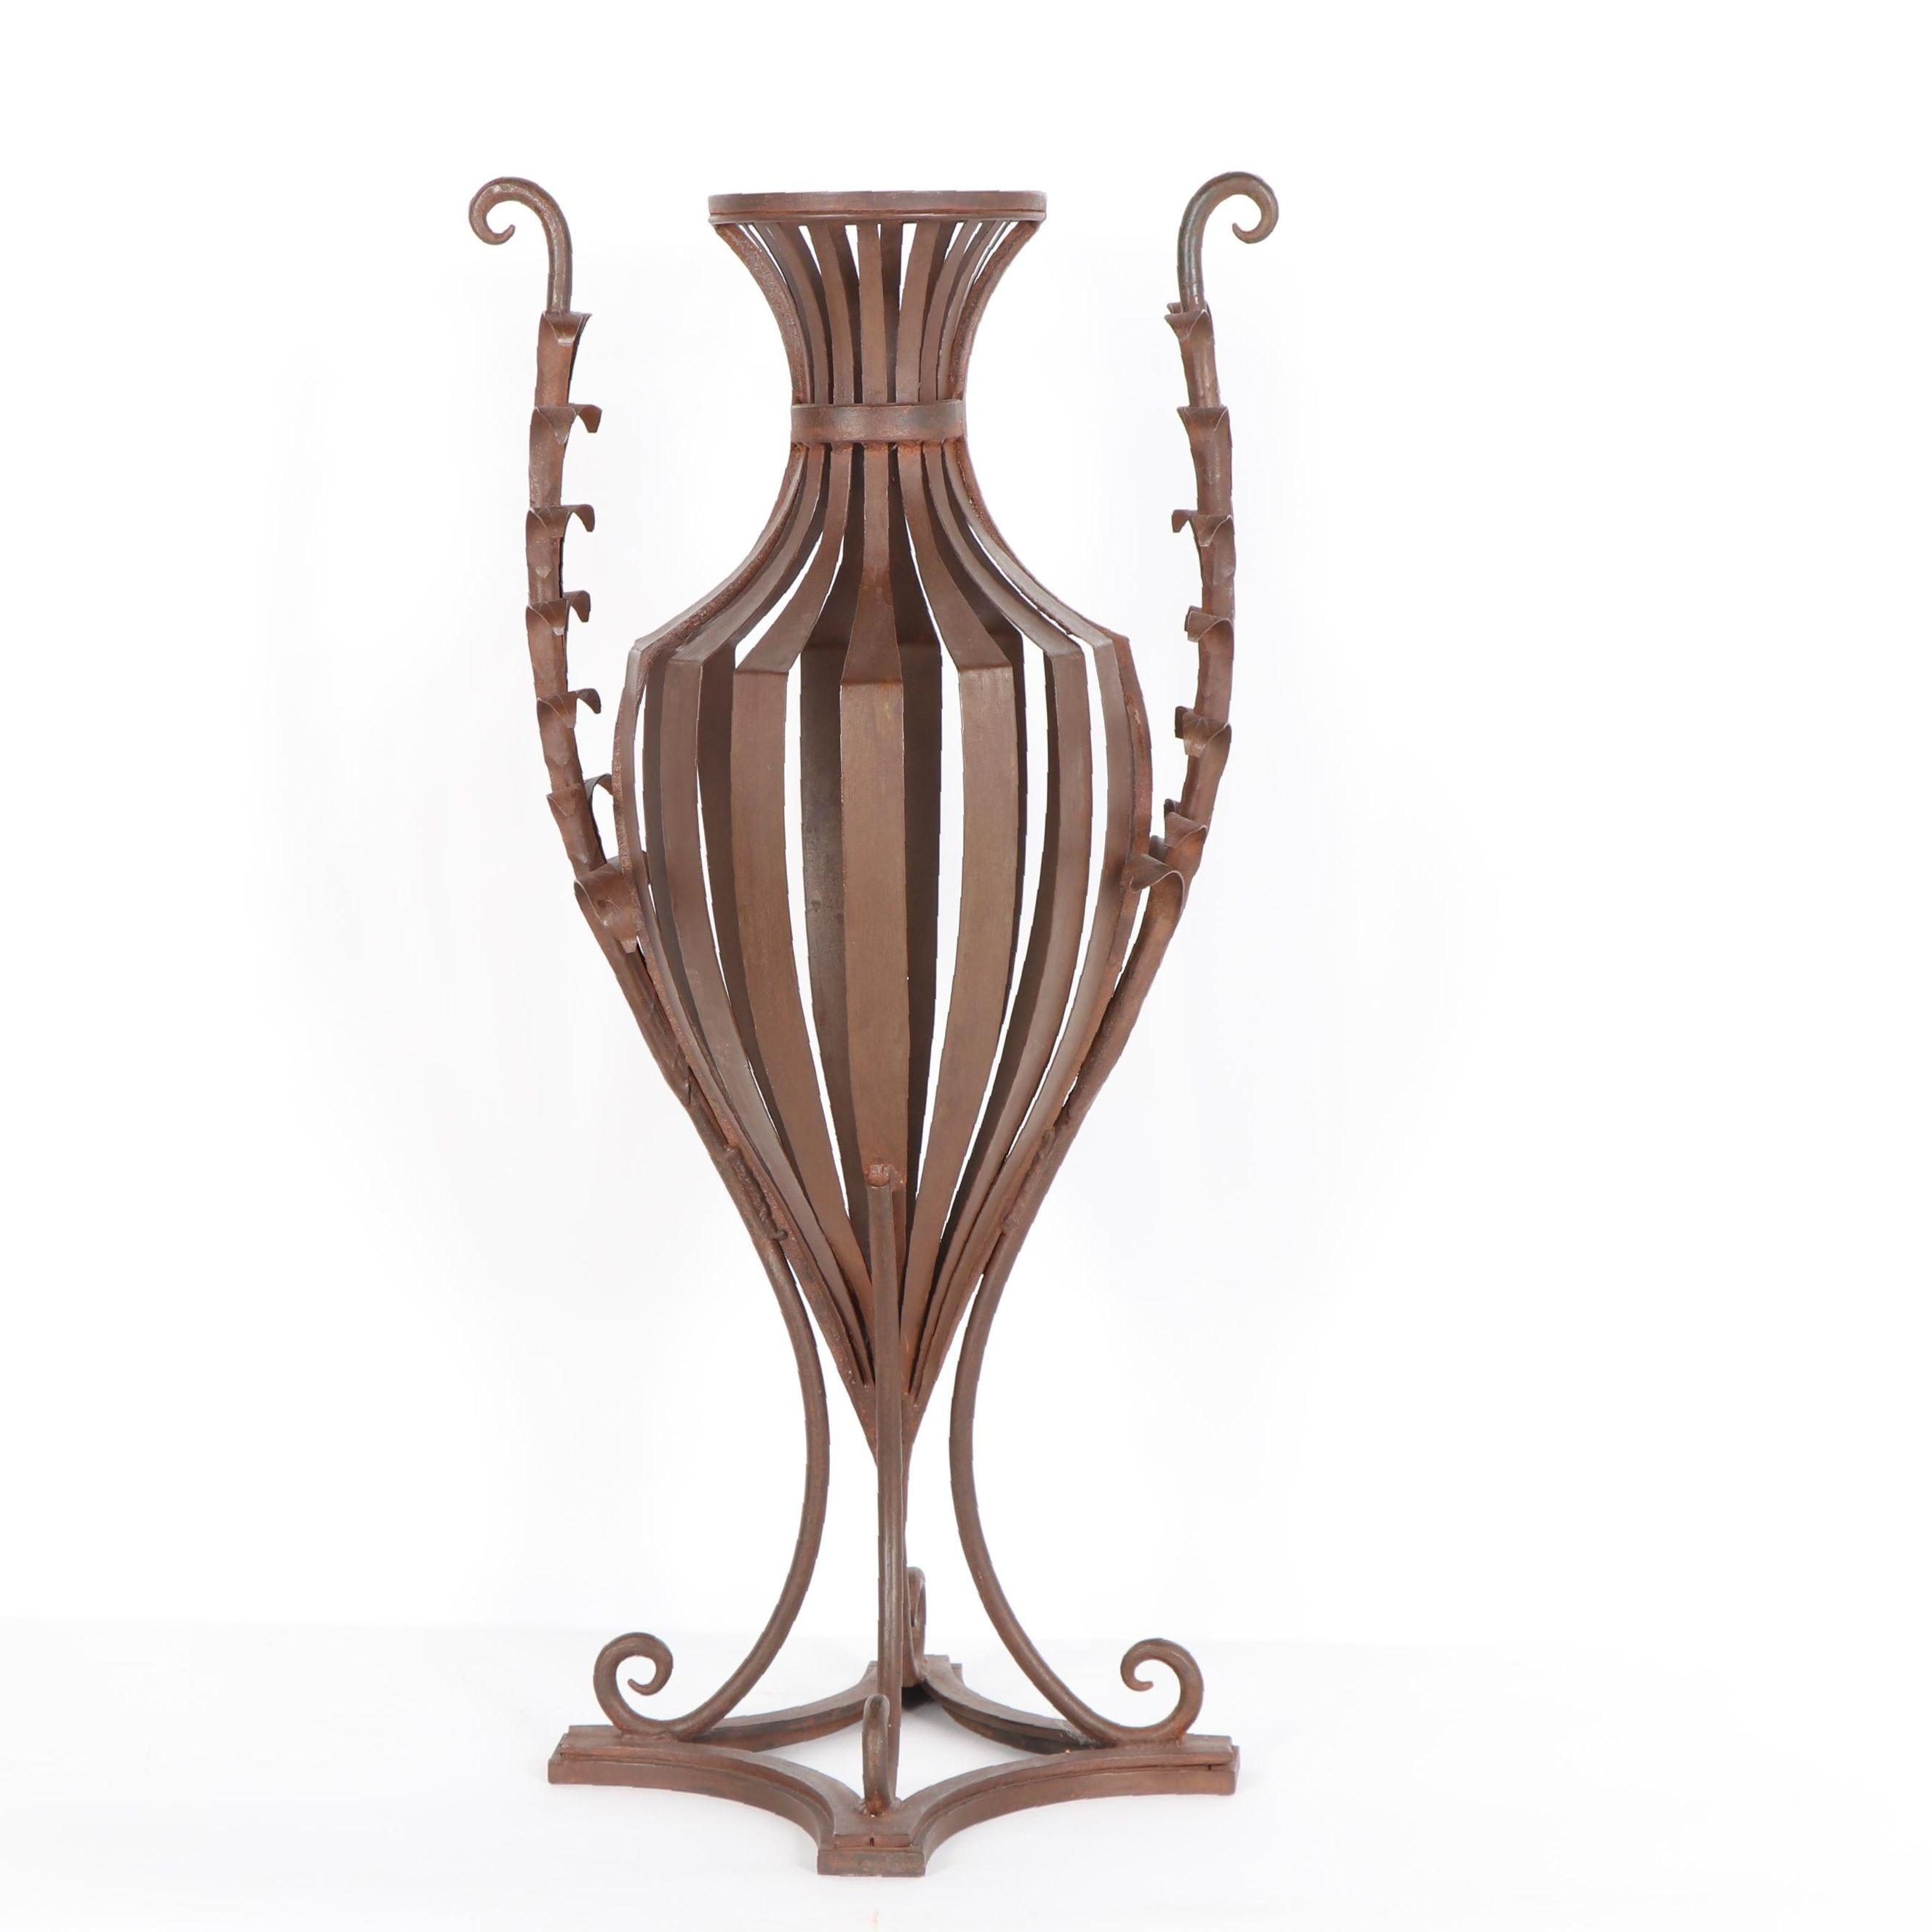 Decorative Metal Urn Form Floor Vase